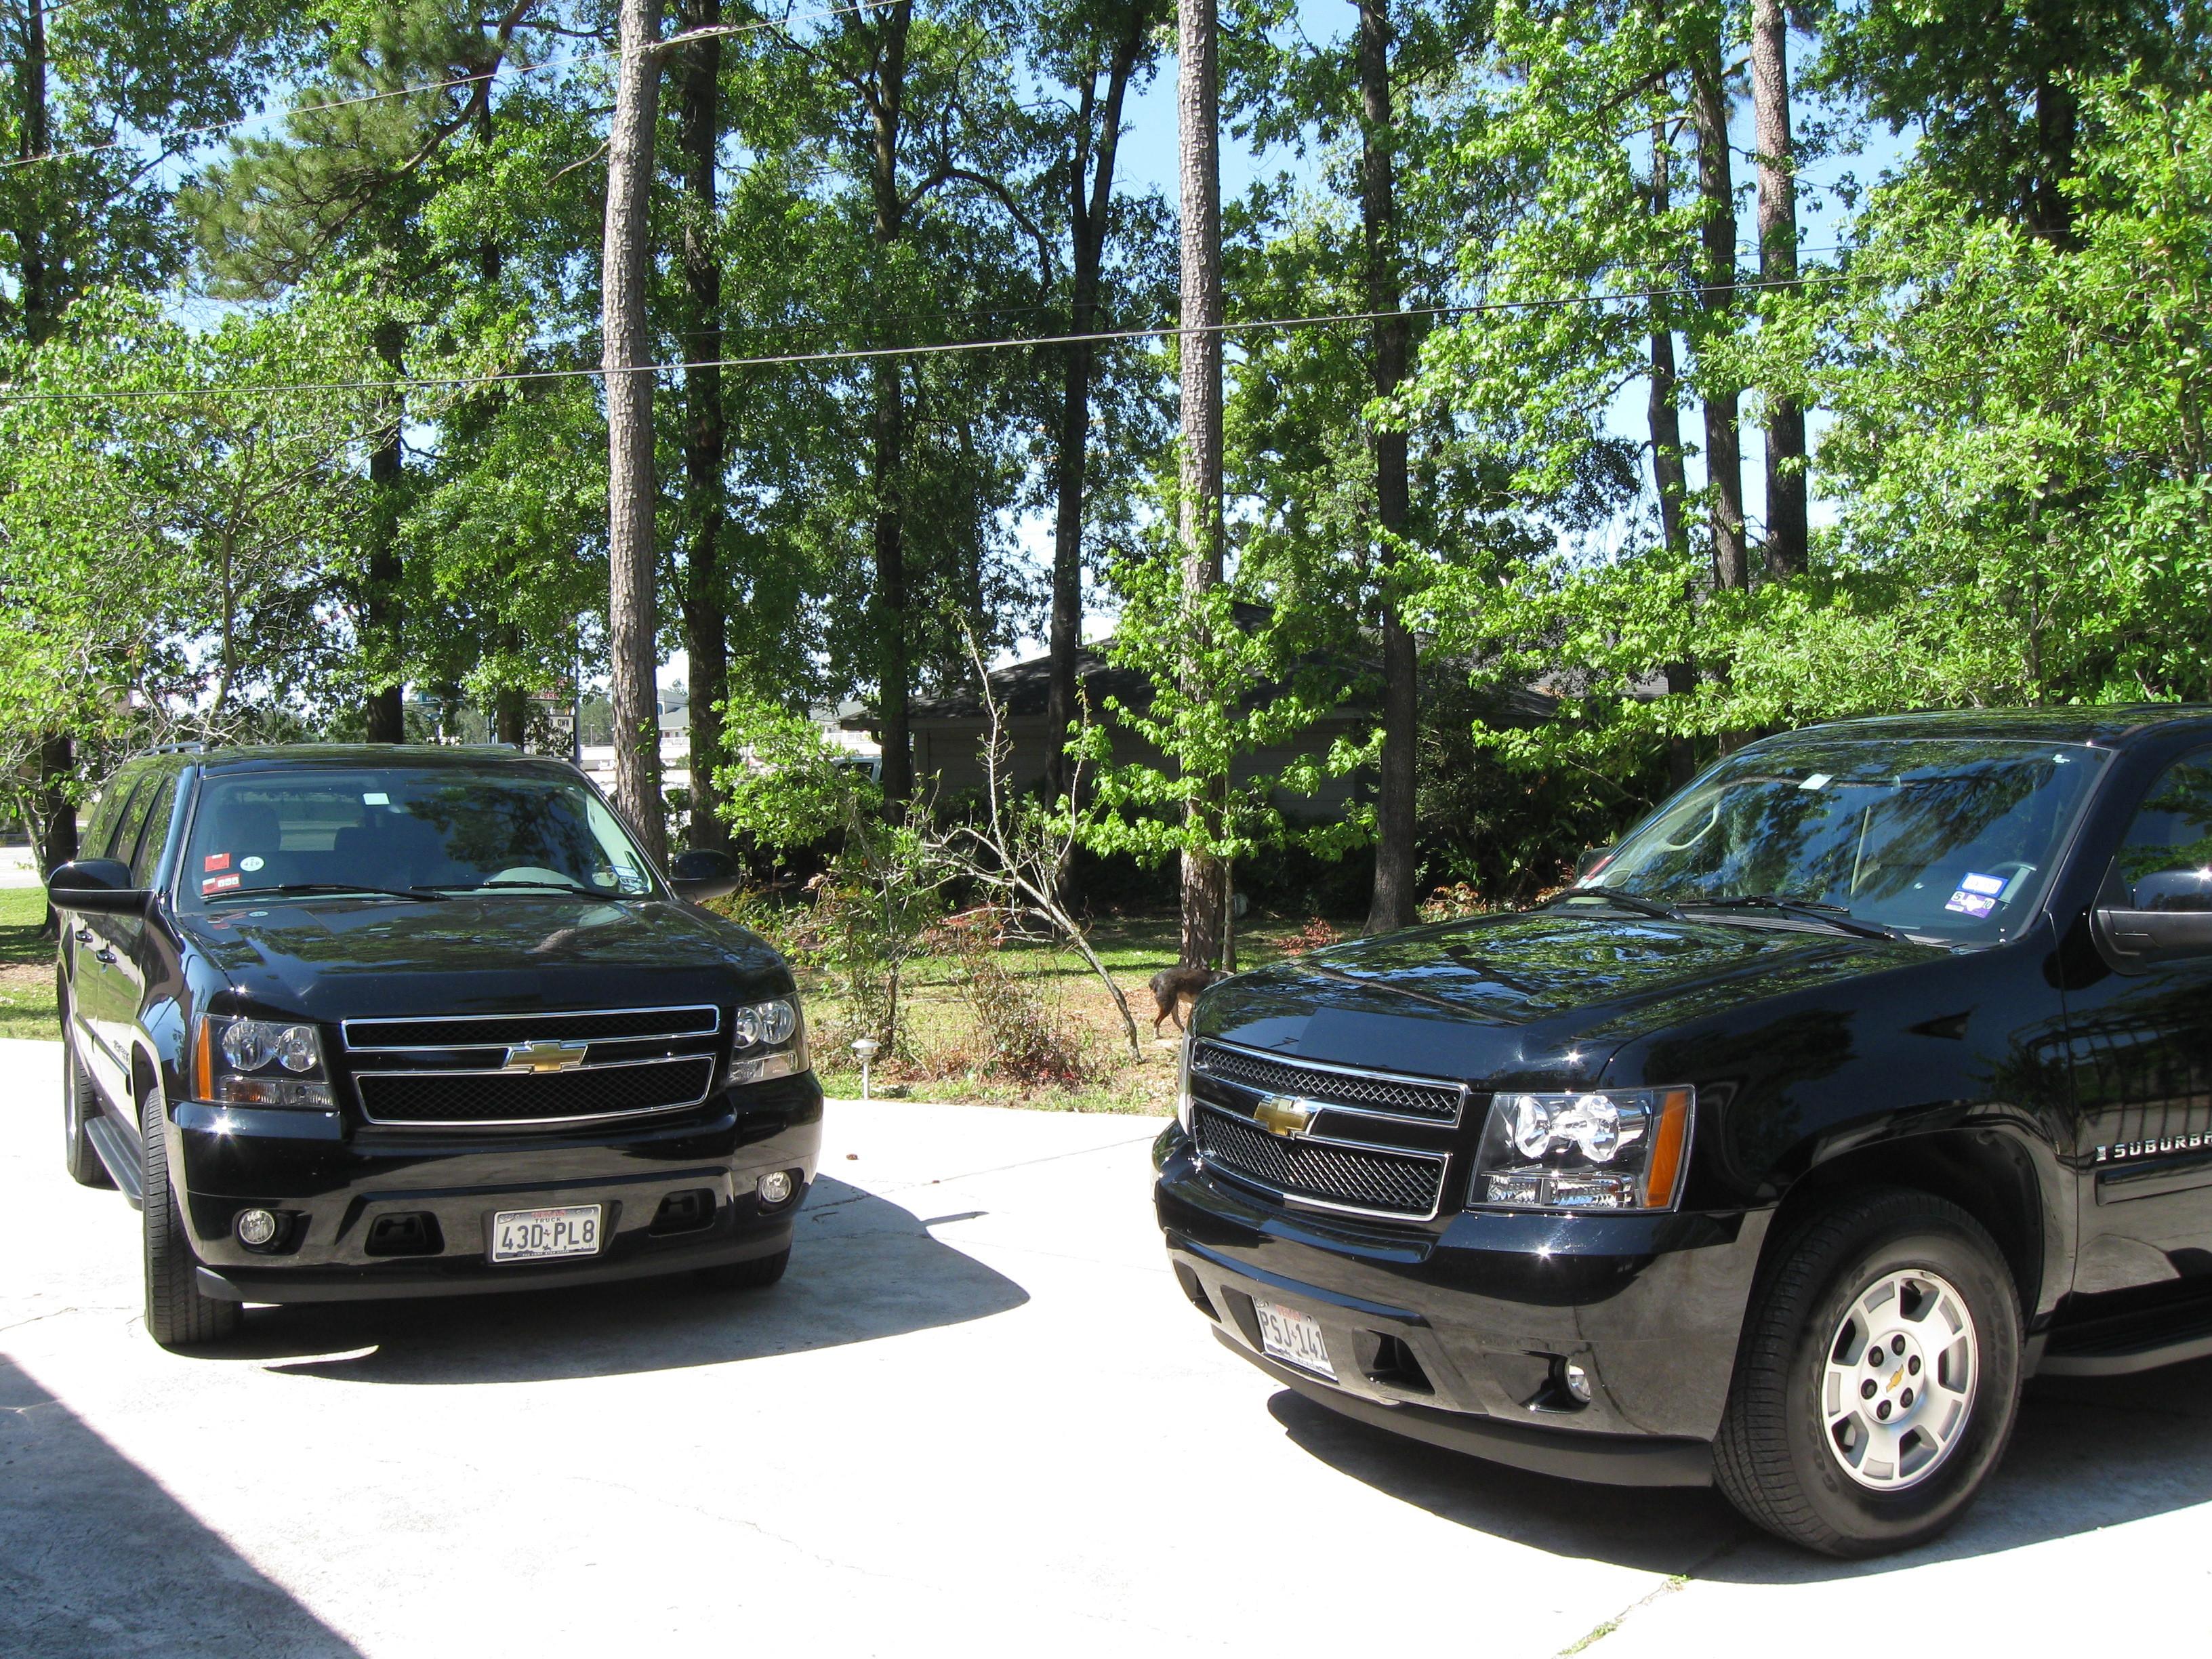 black, Wedding, Transportation, inc, Corporate limousines of tx, Suvs